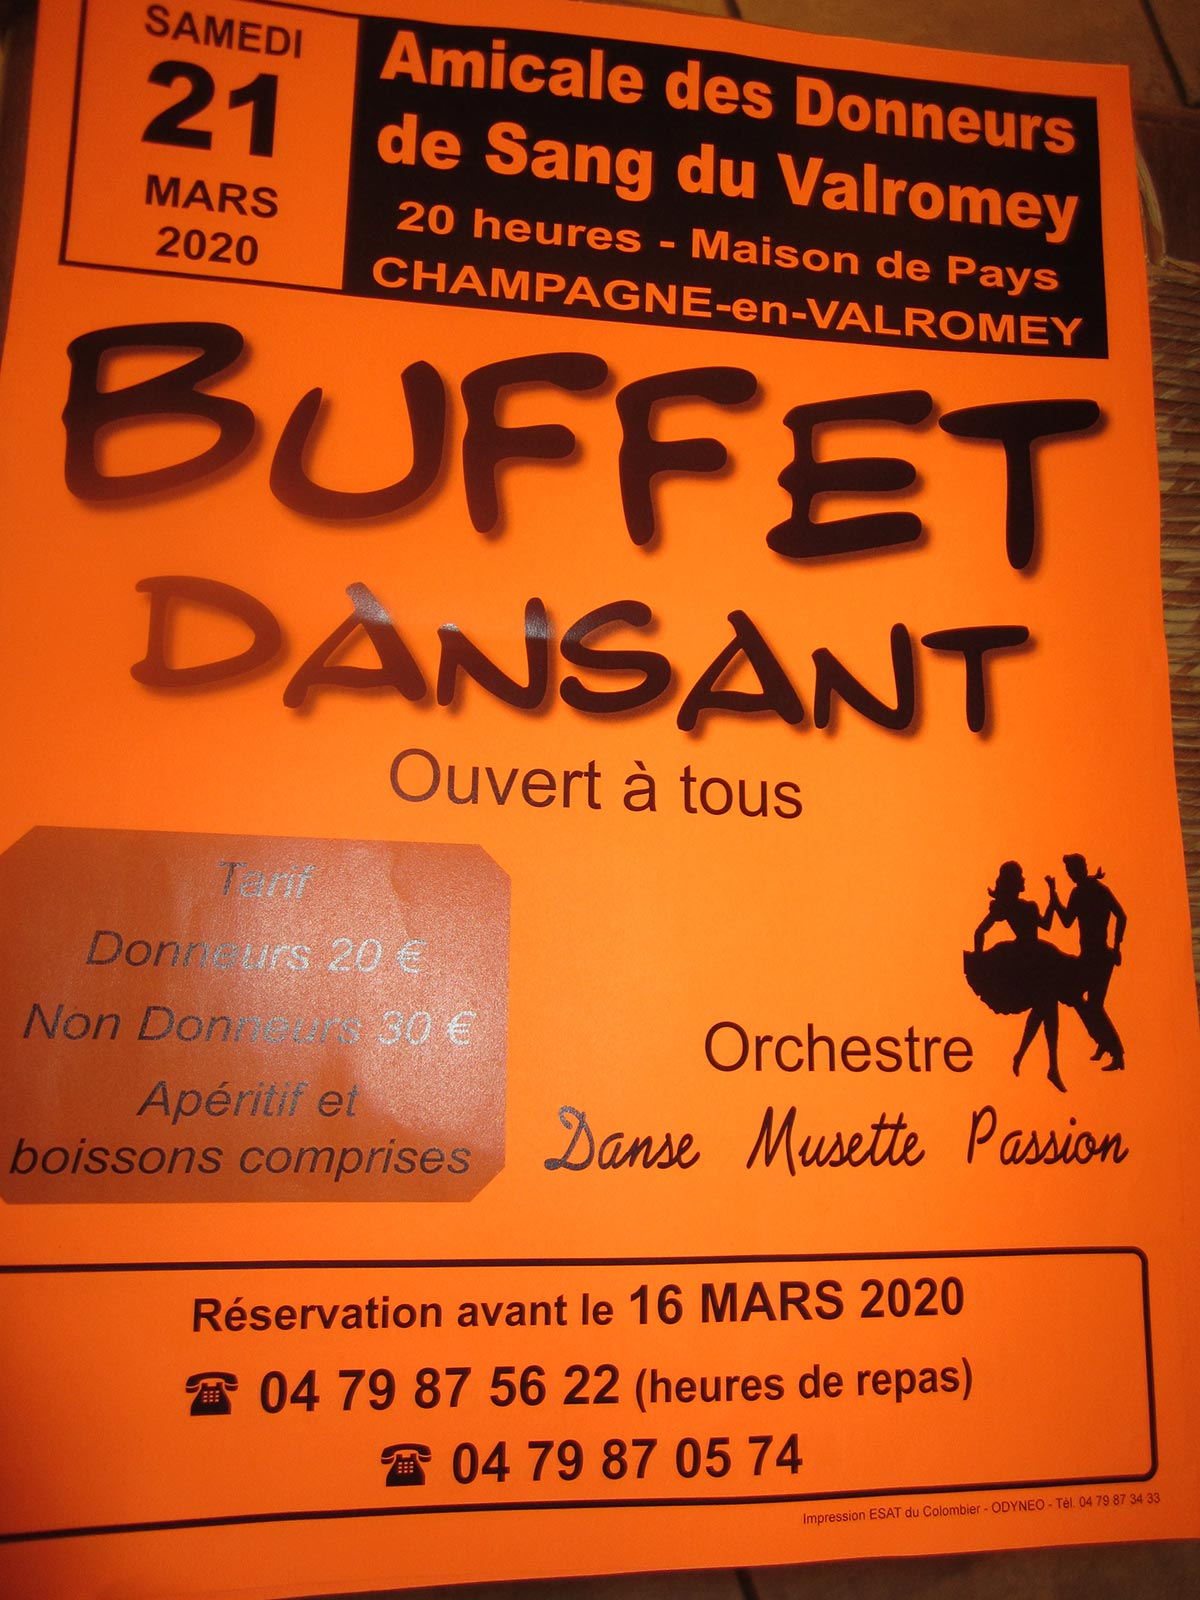 buffet_dansant_champagne